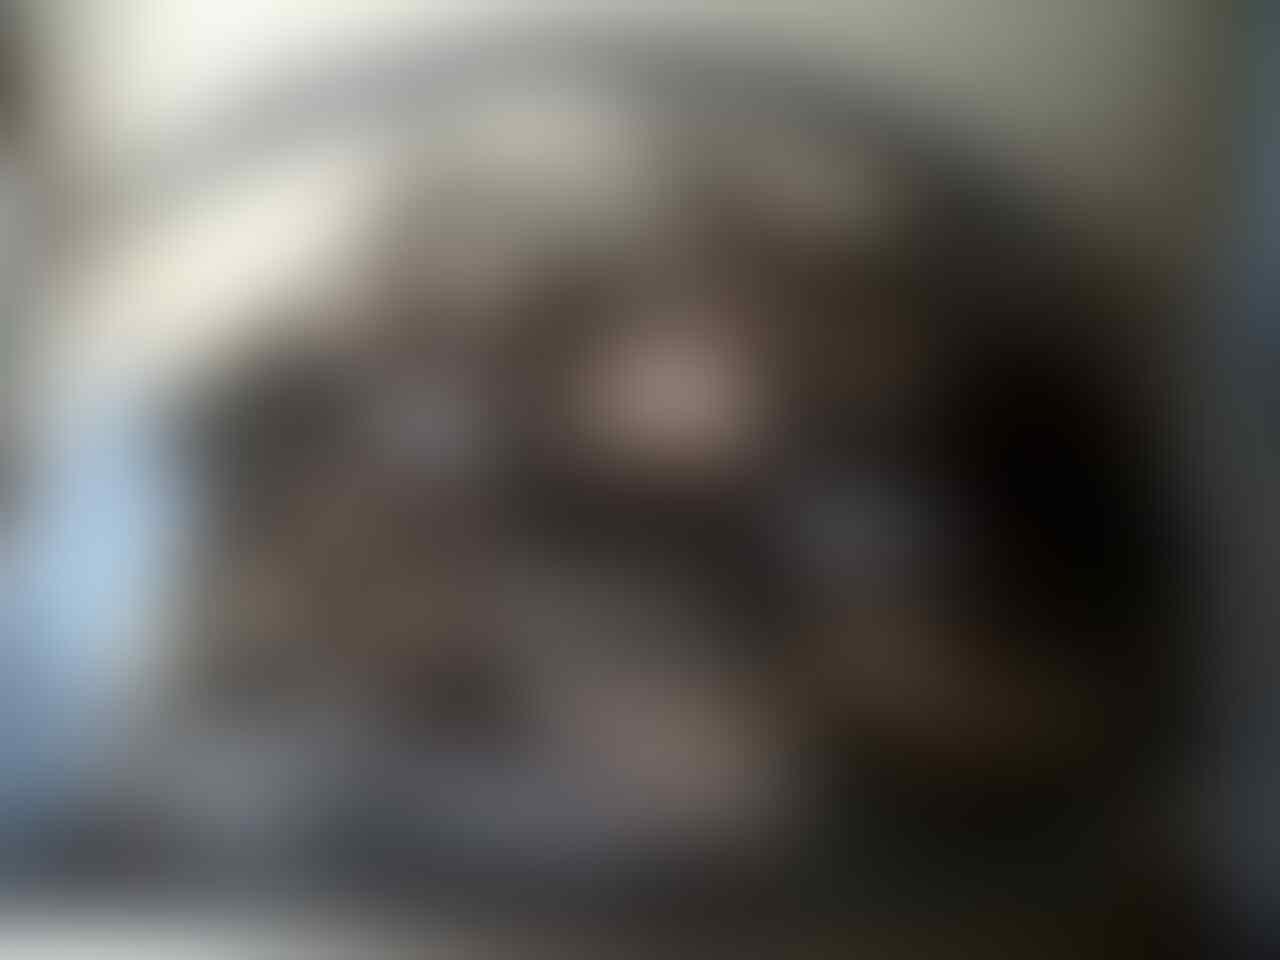 Footstep new jupiter mx atau old jupiter mx(sudah cakram belakang)